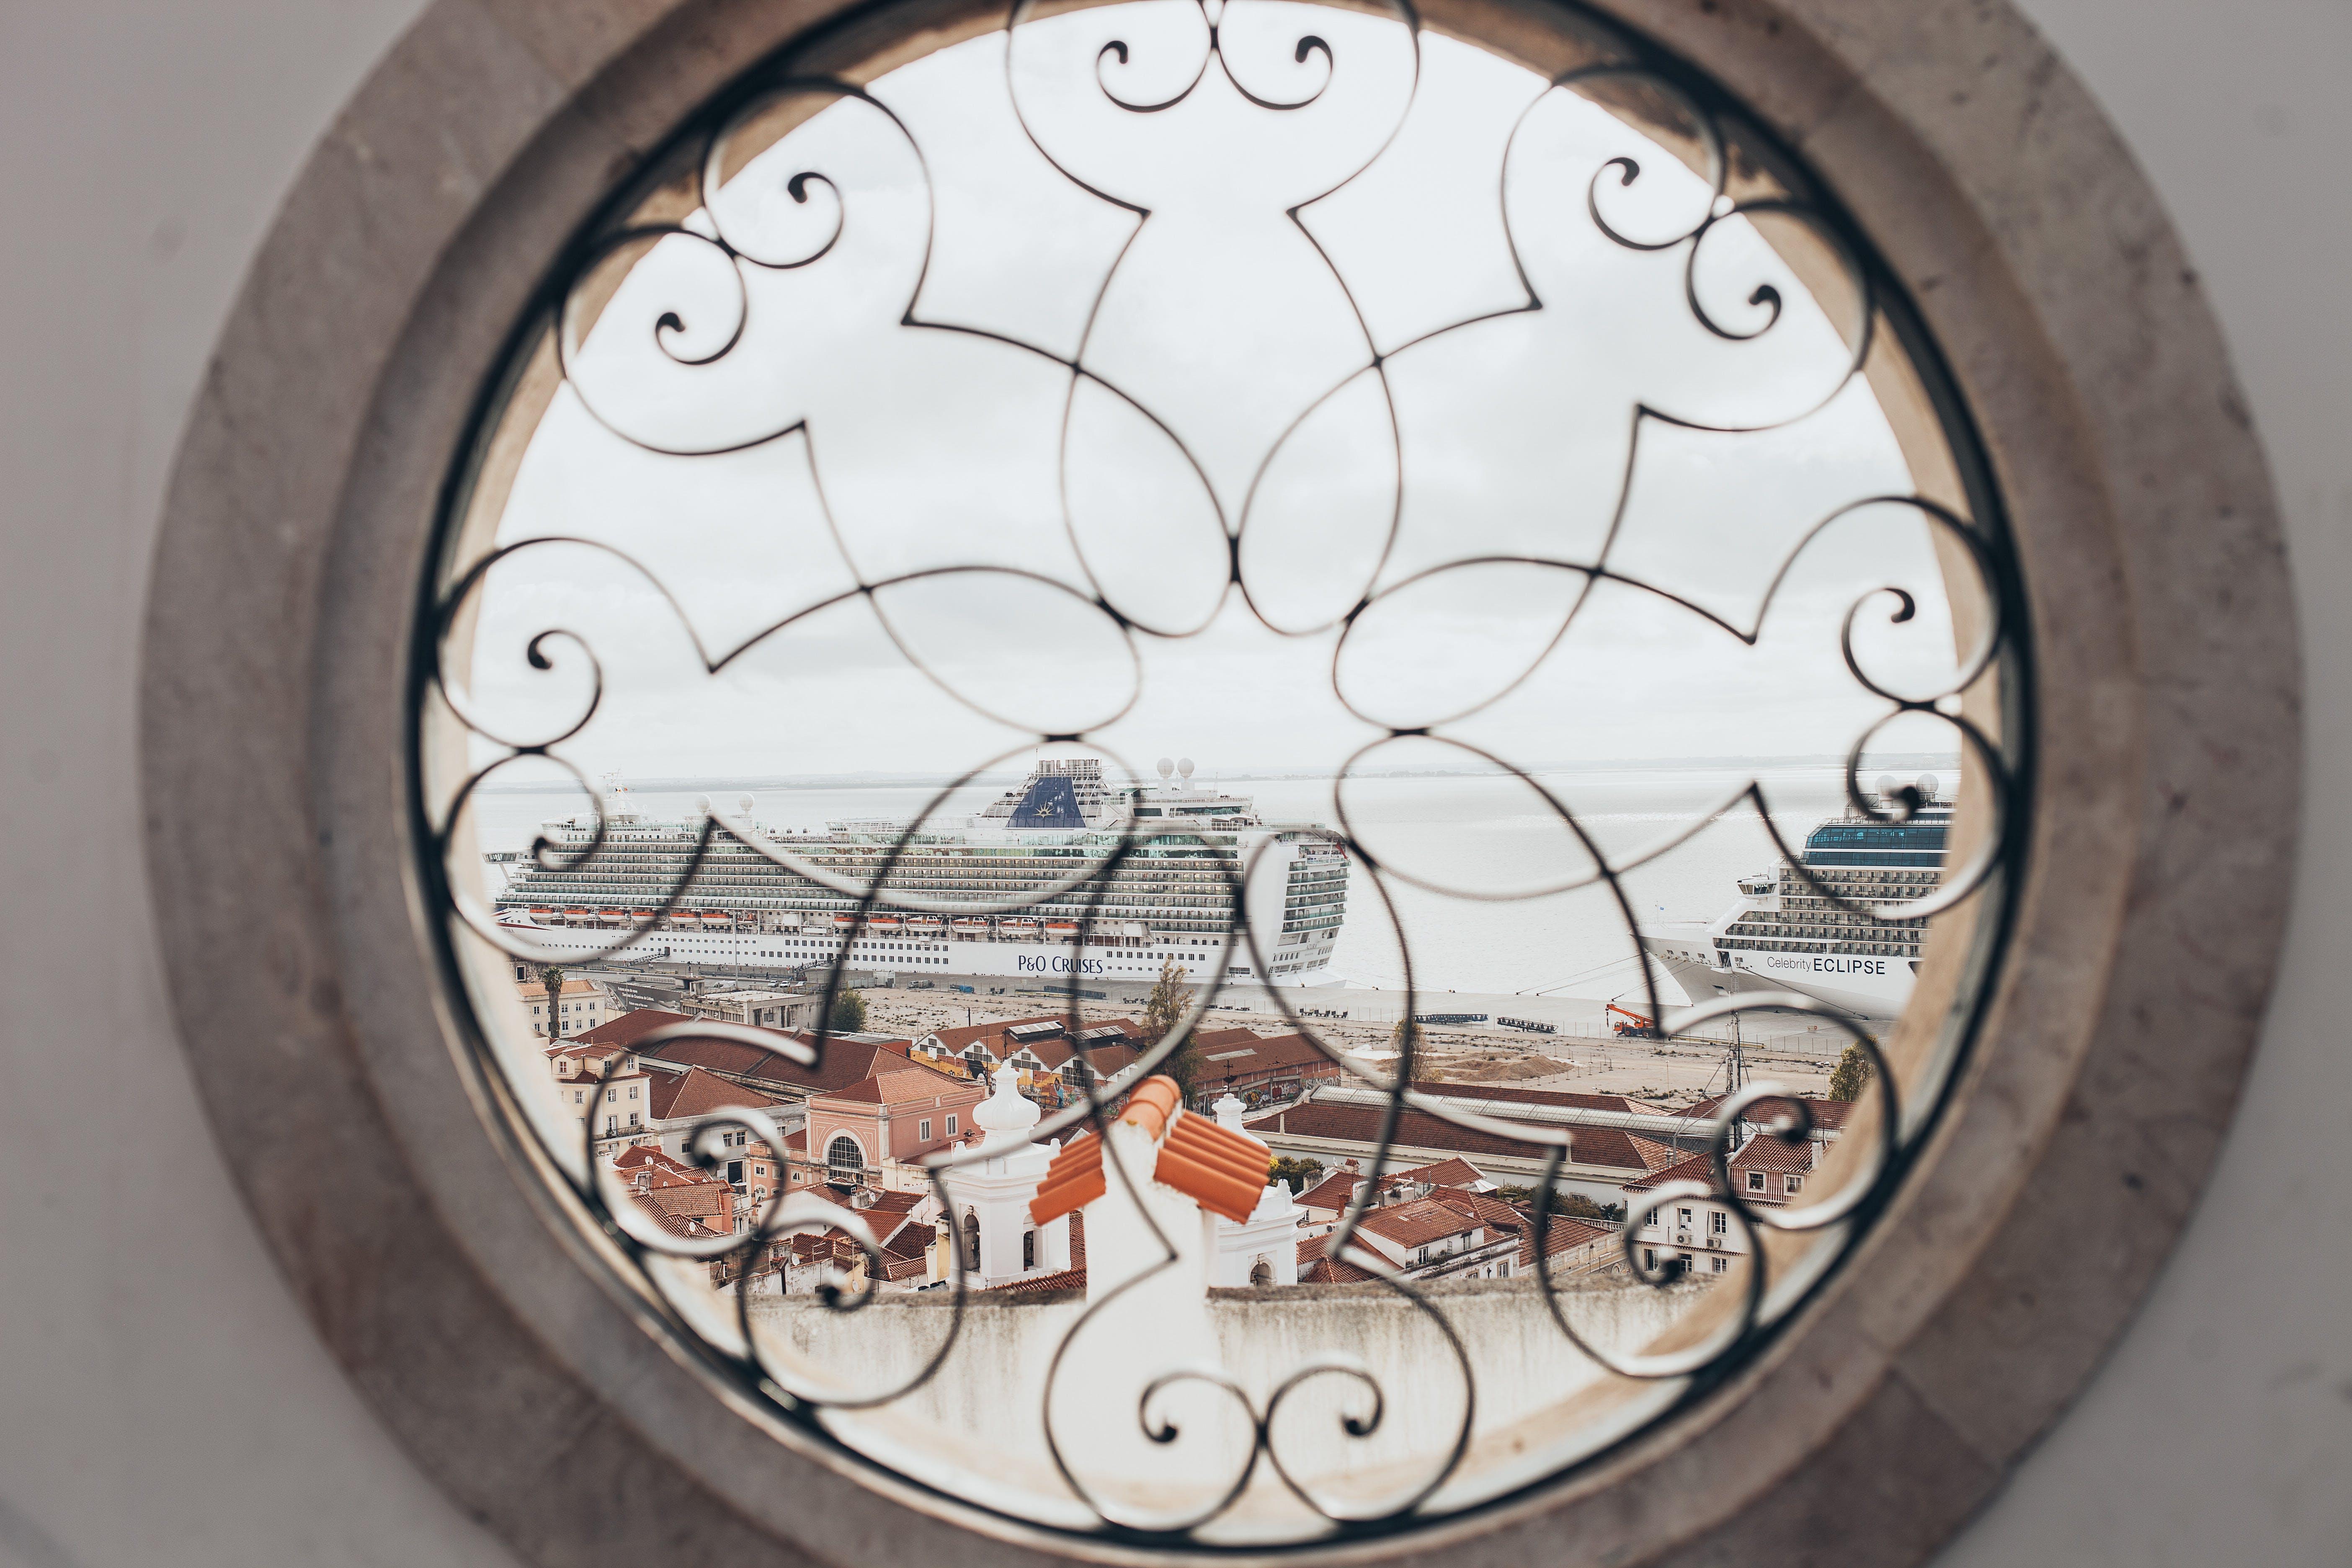 Kostenloses Stock Foto zu abbildung, antik, architektur, beton